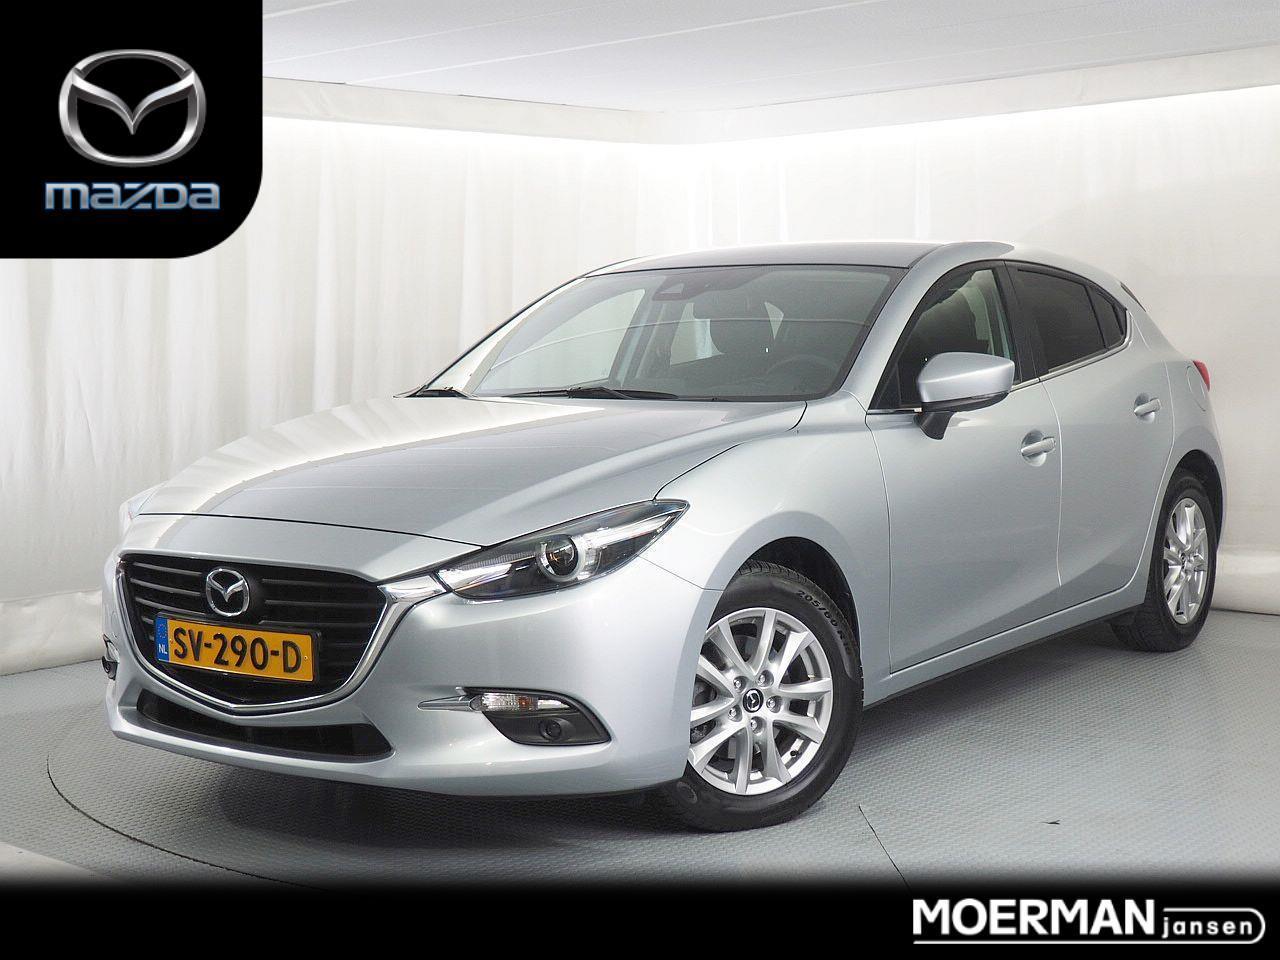 Mazda 3 2.0 skylease+ / 5 drs / navigatie / camera / head-up display / 32.000km / 1e eigenaar